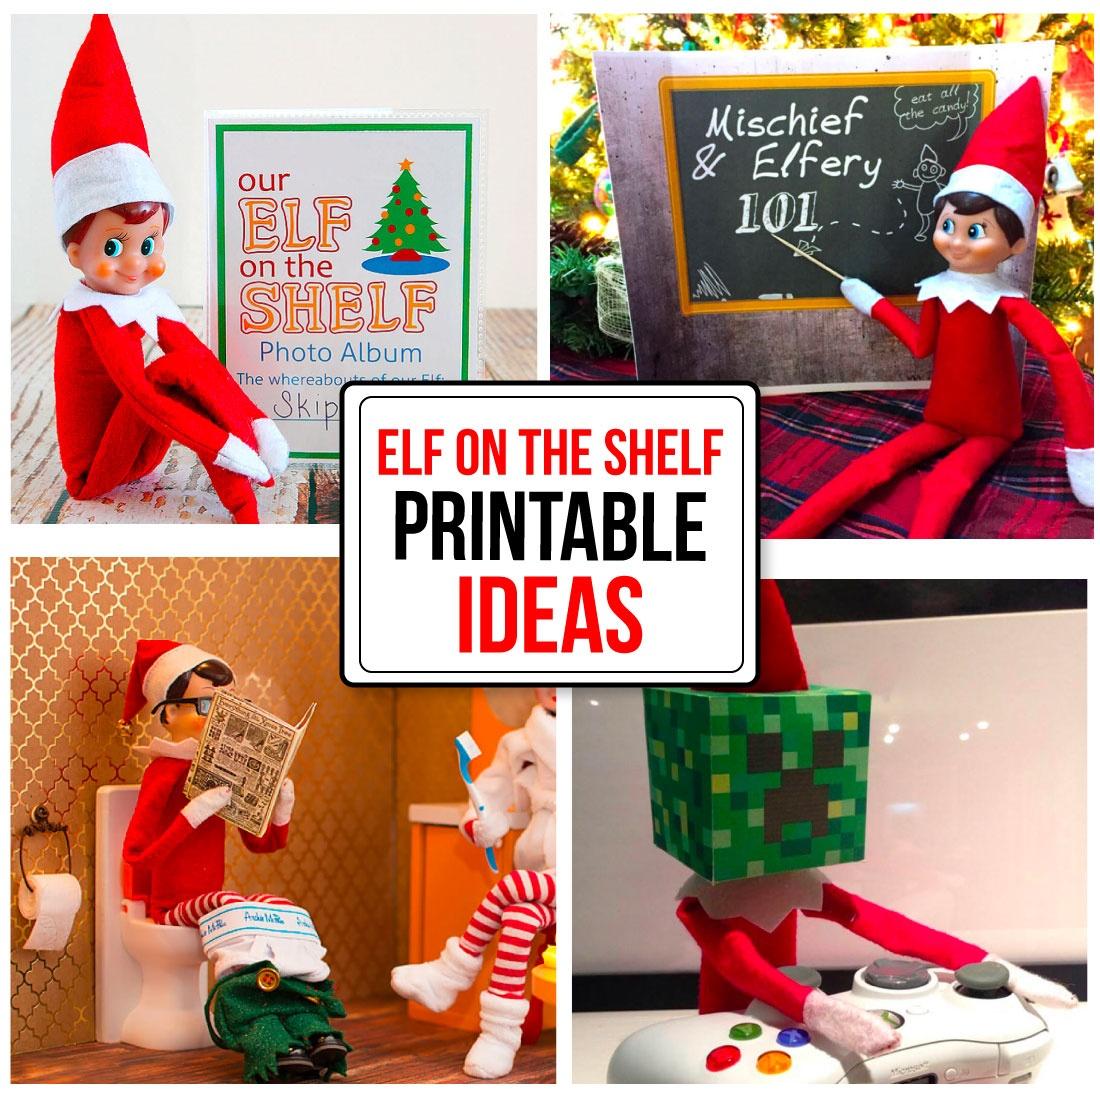 Printable Elf On The Shelf Ideas - Elf On The Shelf Free Printable Ideas